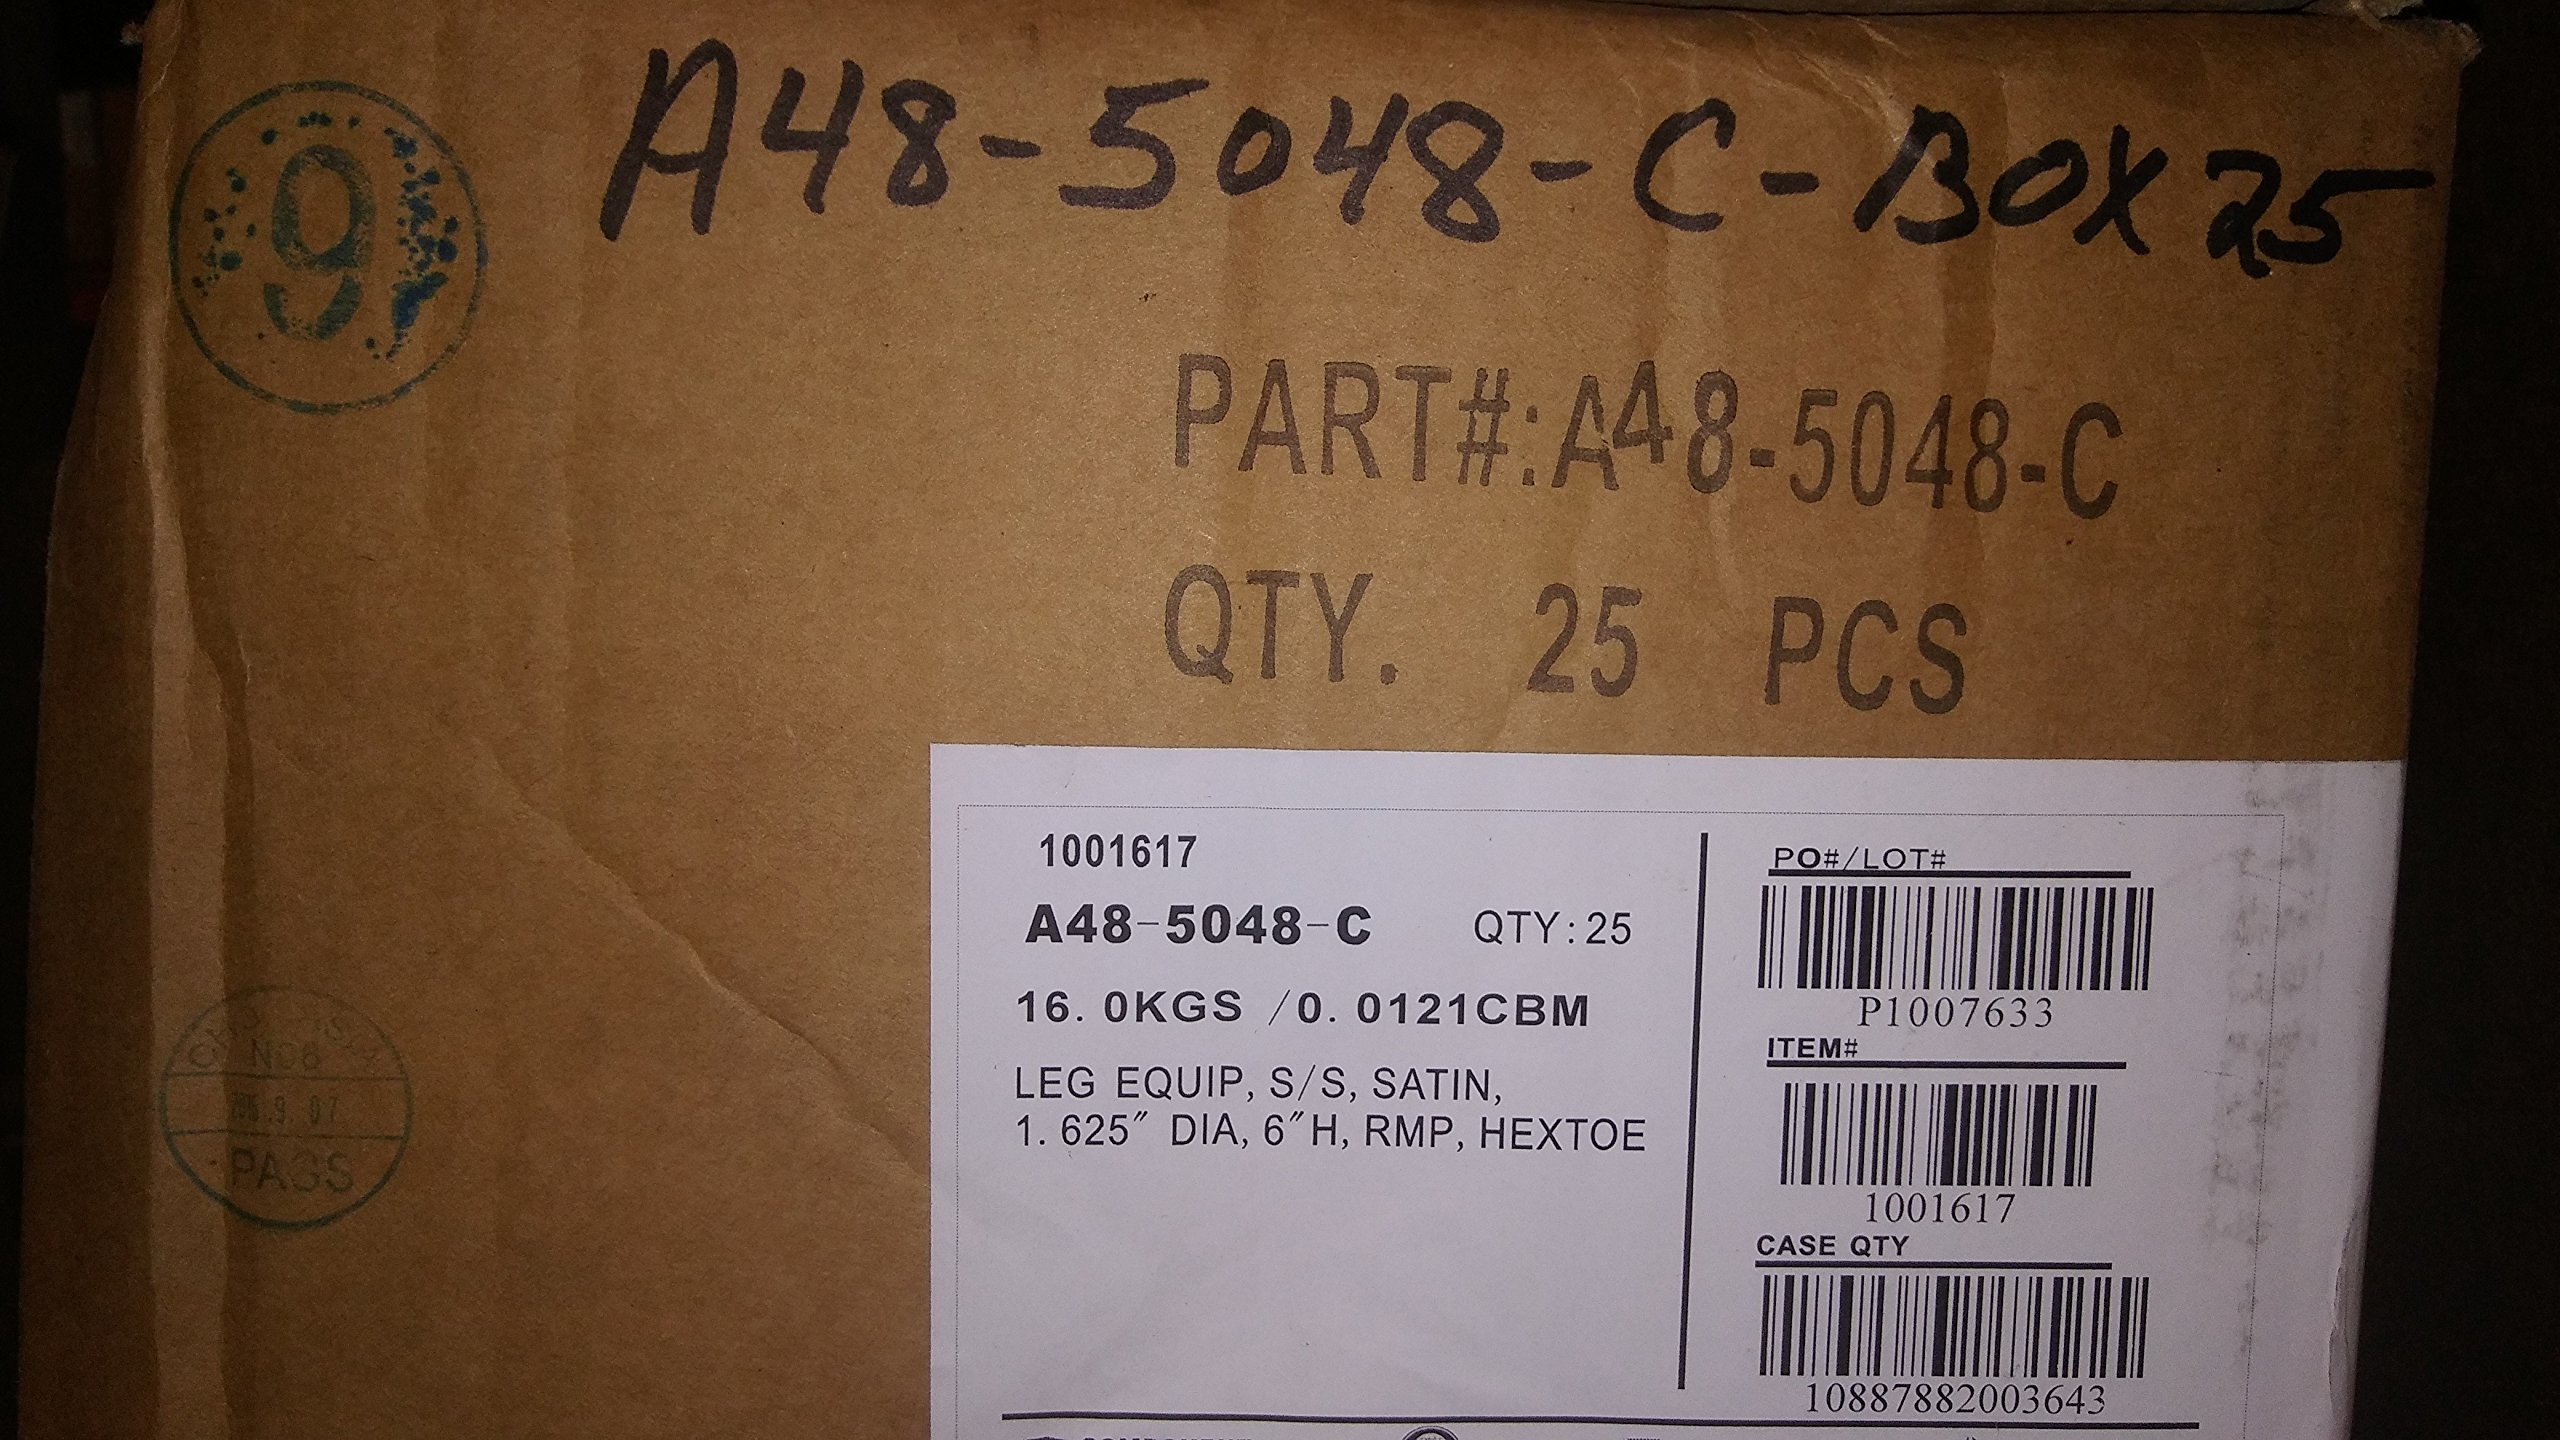 Component Hardware A48-5048-C 6'' case of 25 Stainless Steel Adjustable Leg Leveler